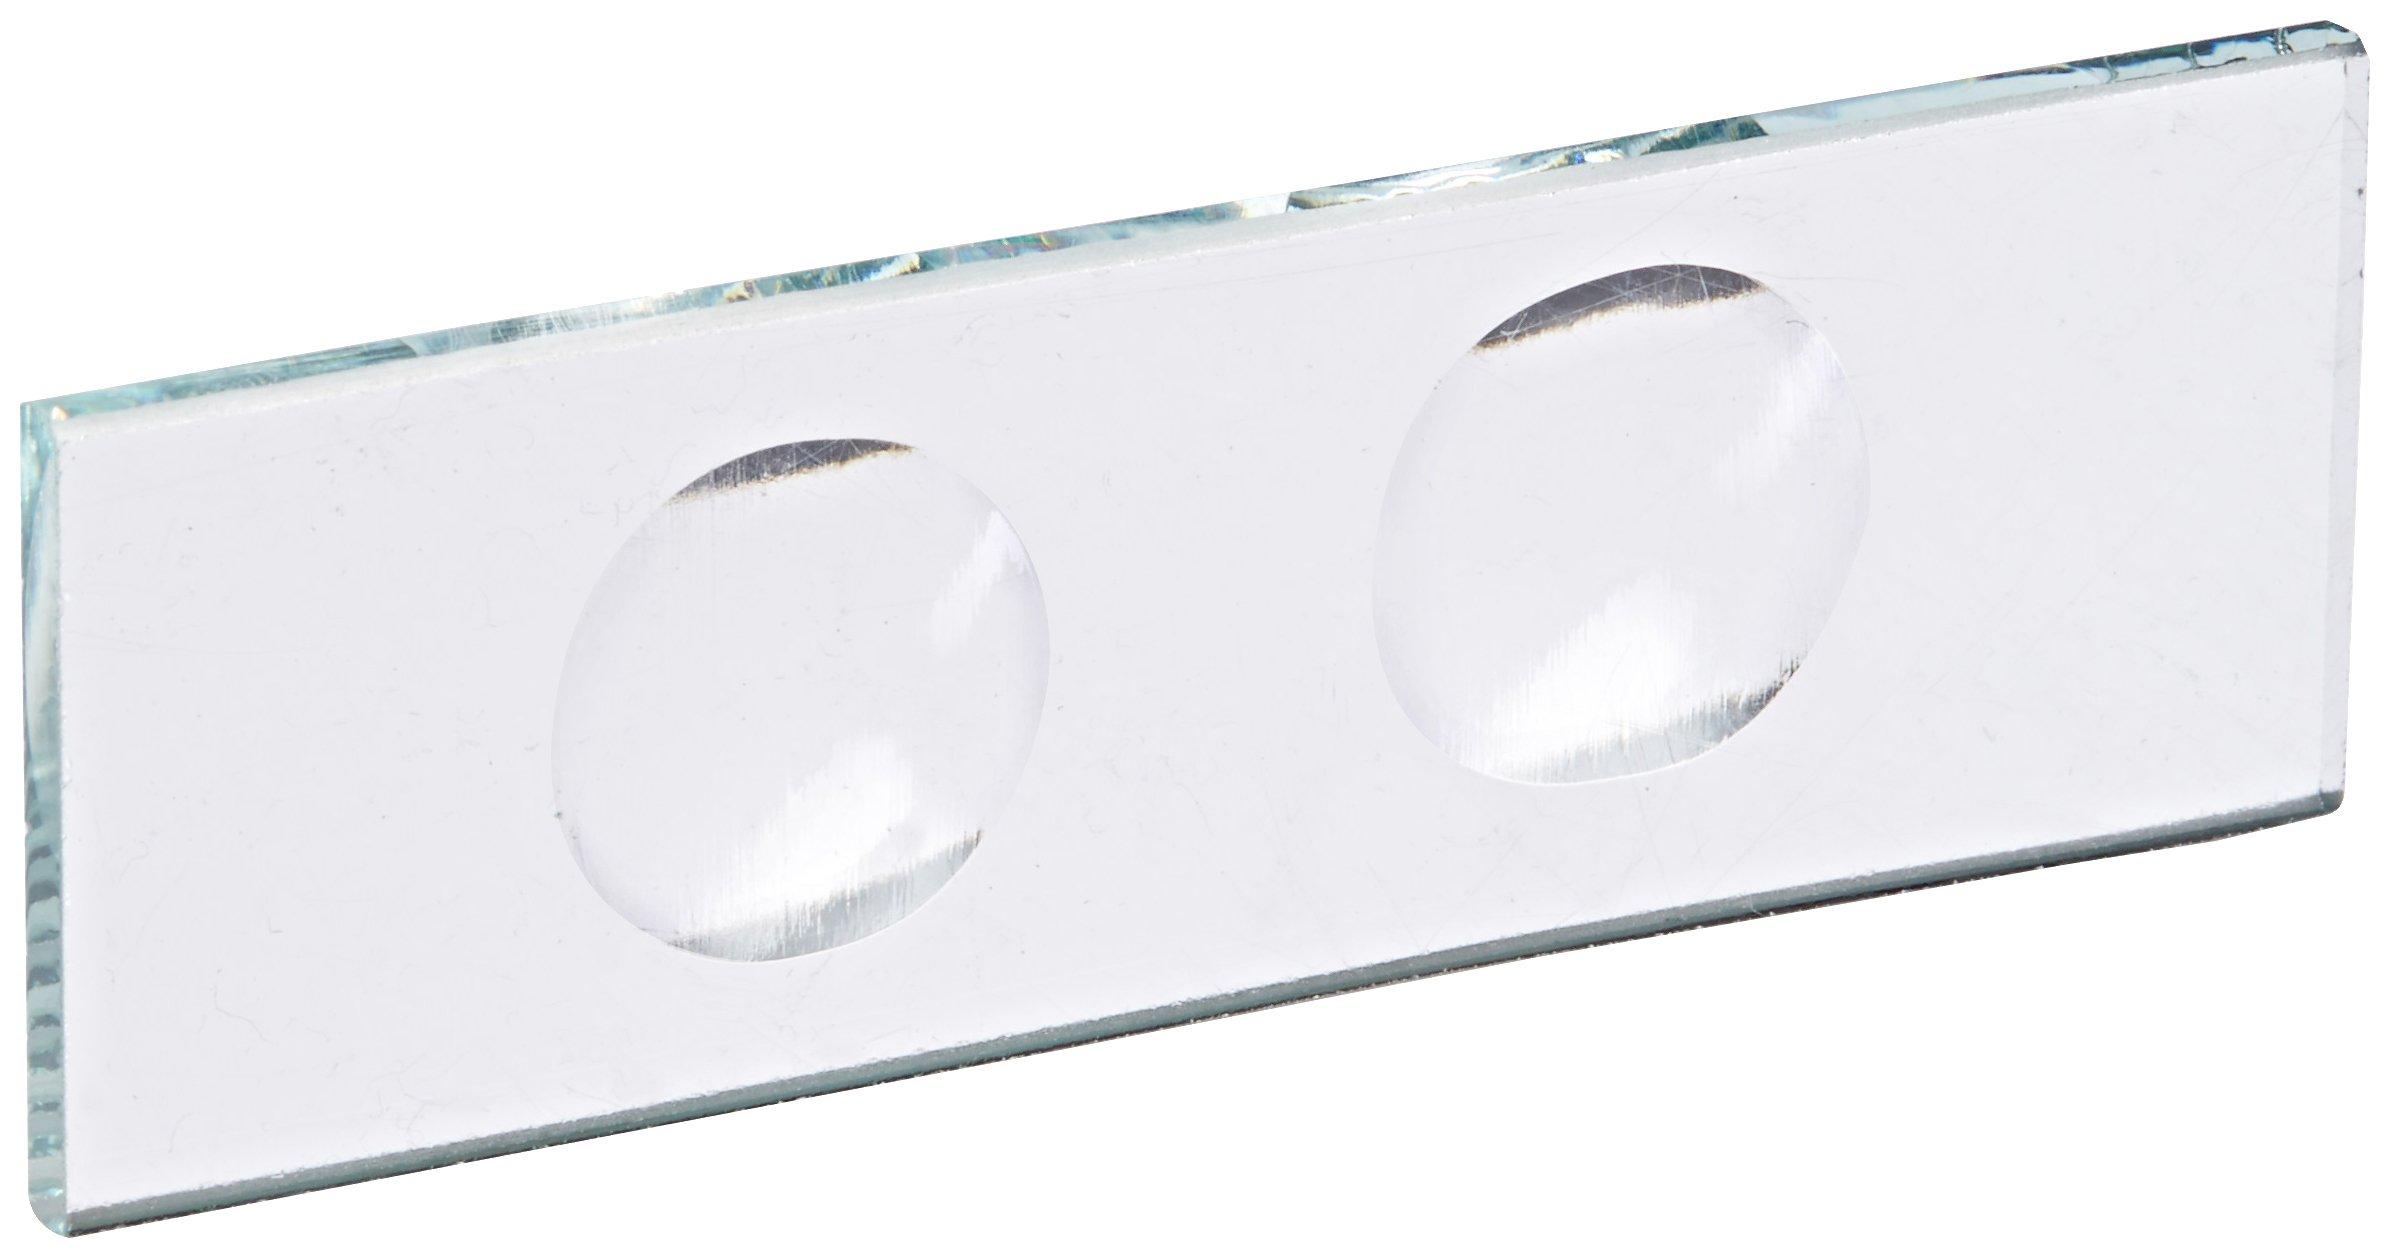 United Scientific CSTK02 Glass Microscope Slide, 2 Concavities (Pack of 12)